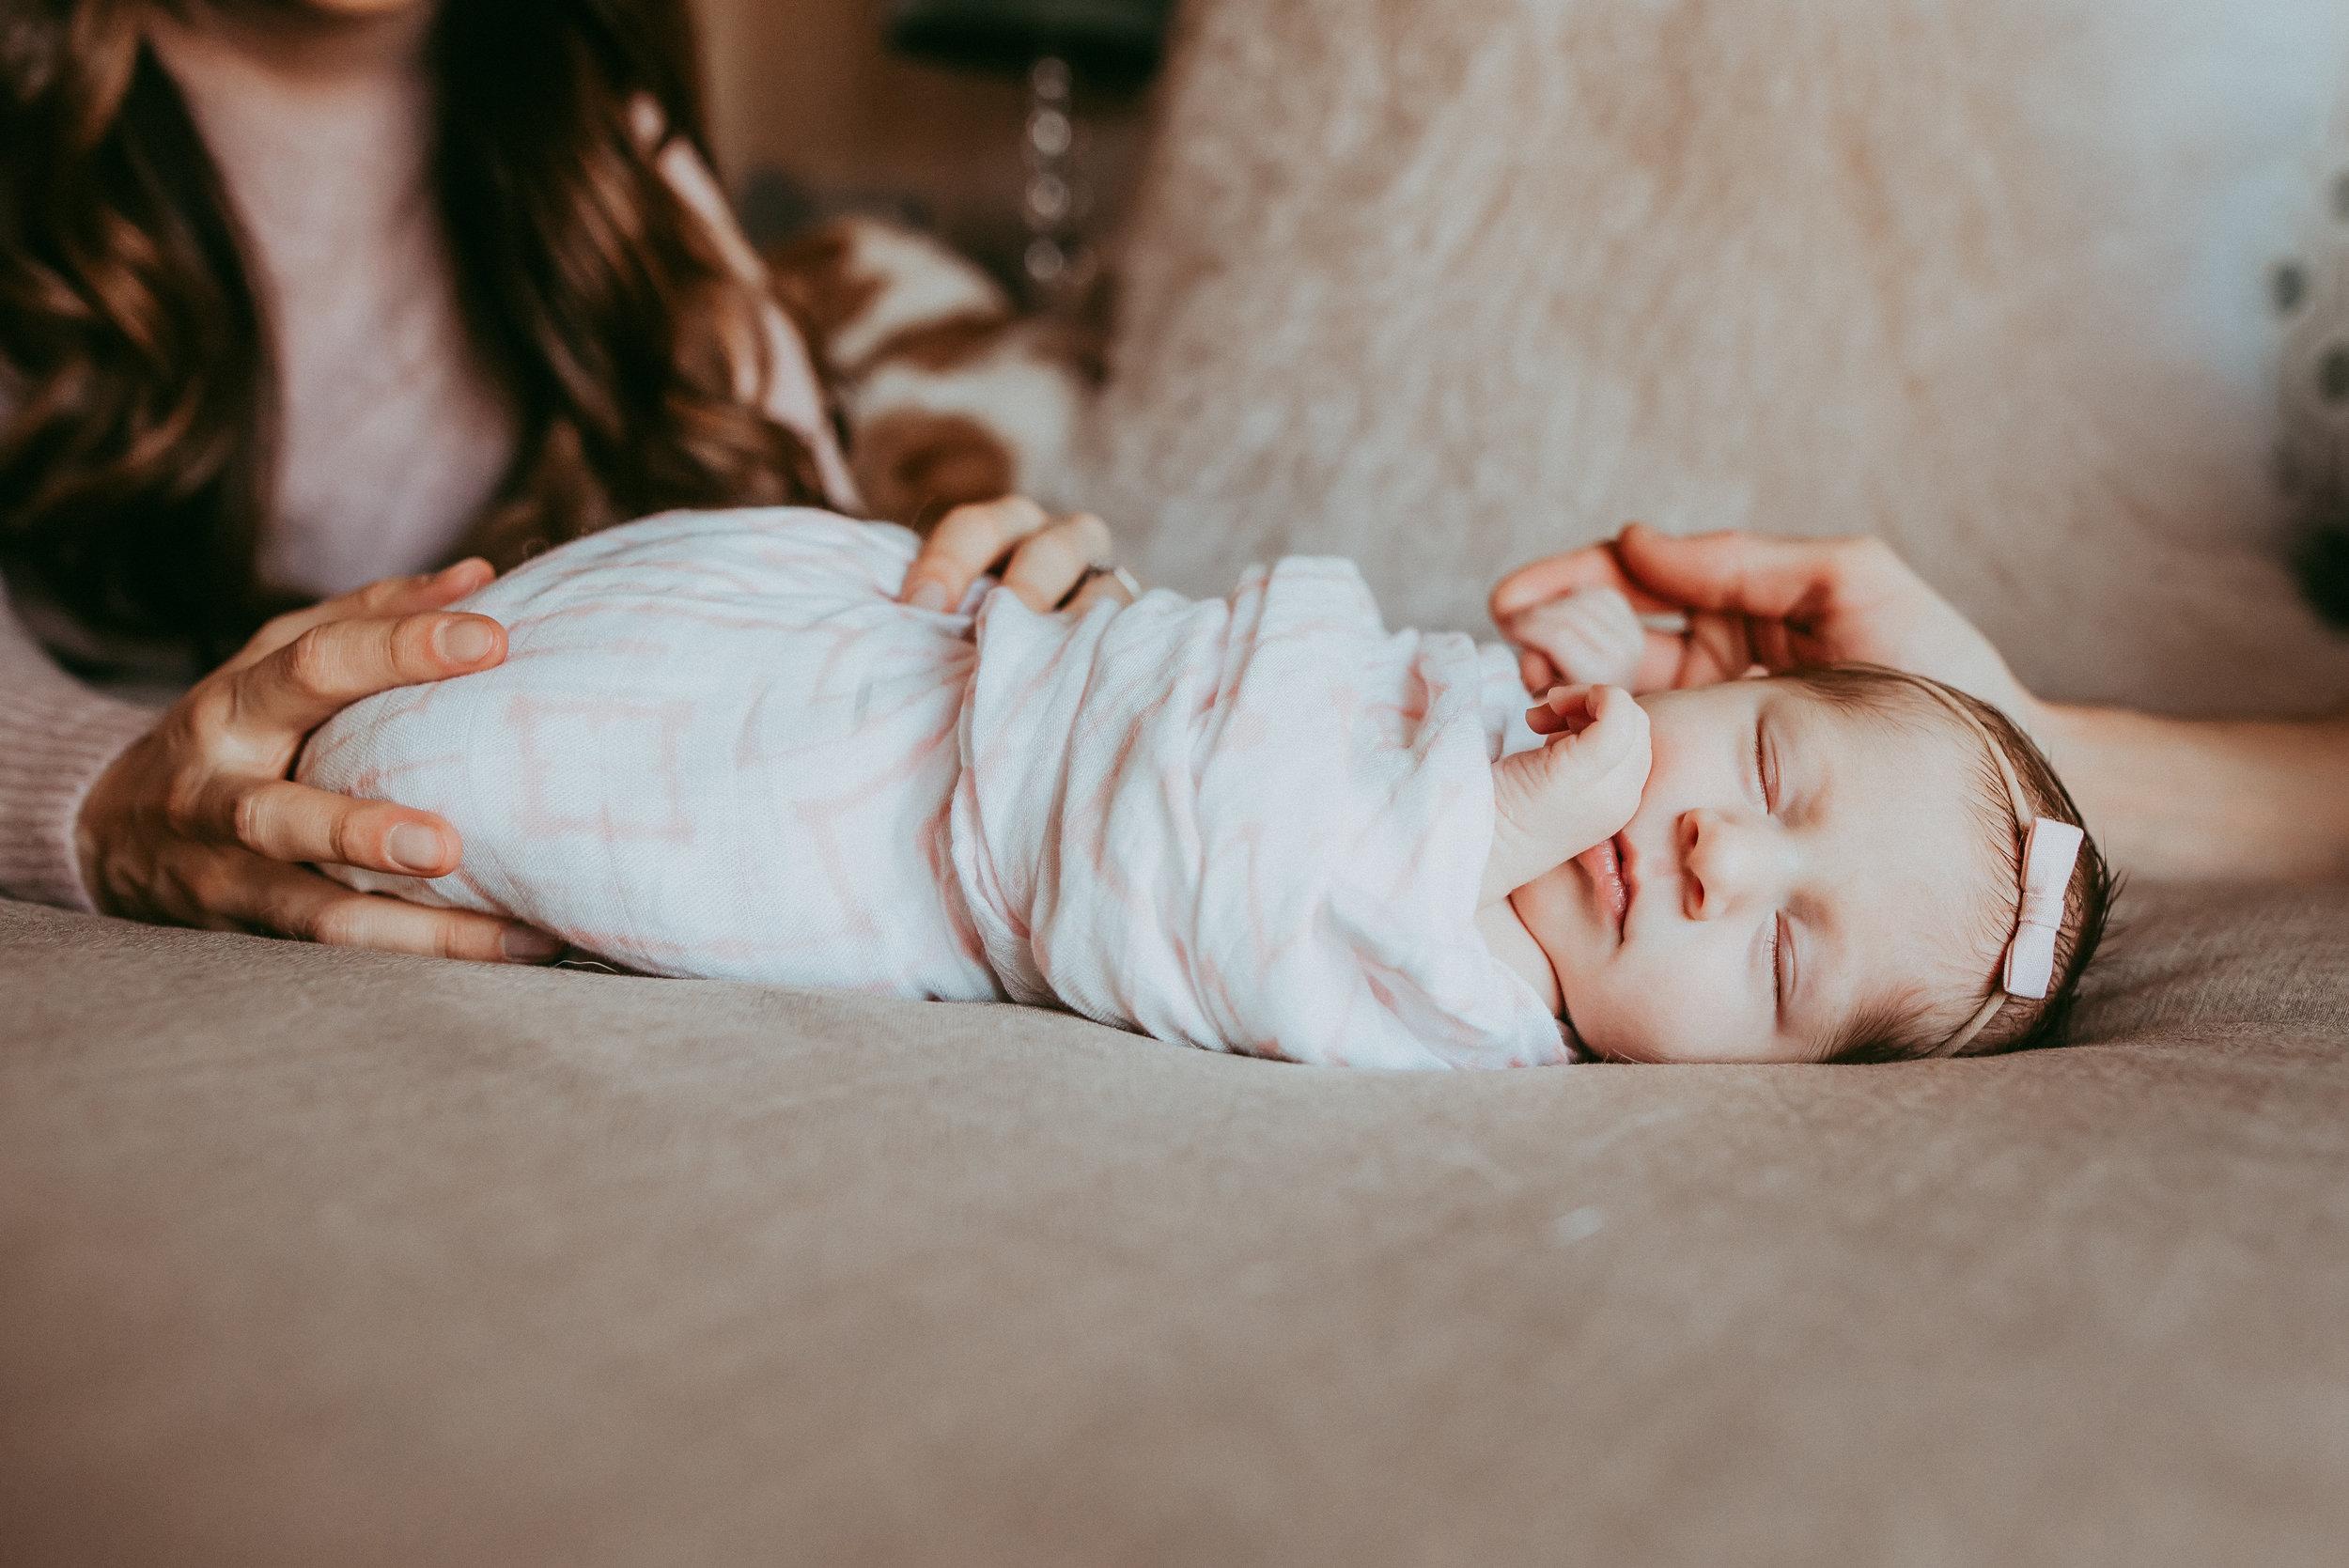 BabyCharlotte_StoriedPhotography-97.jpg